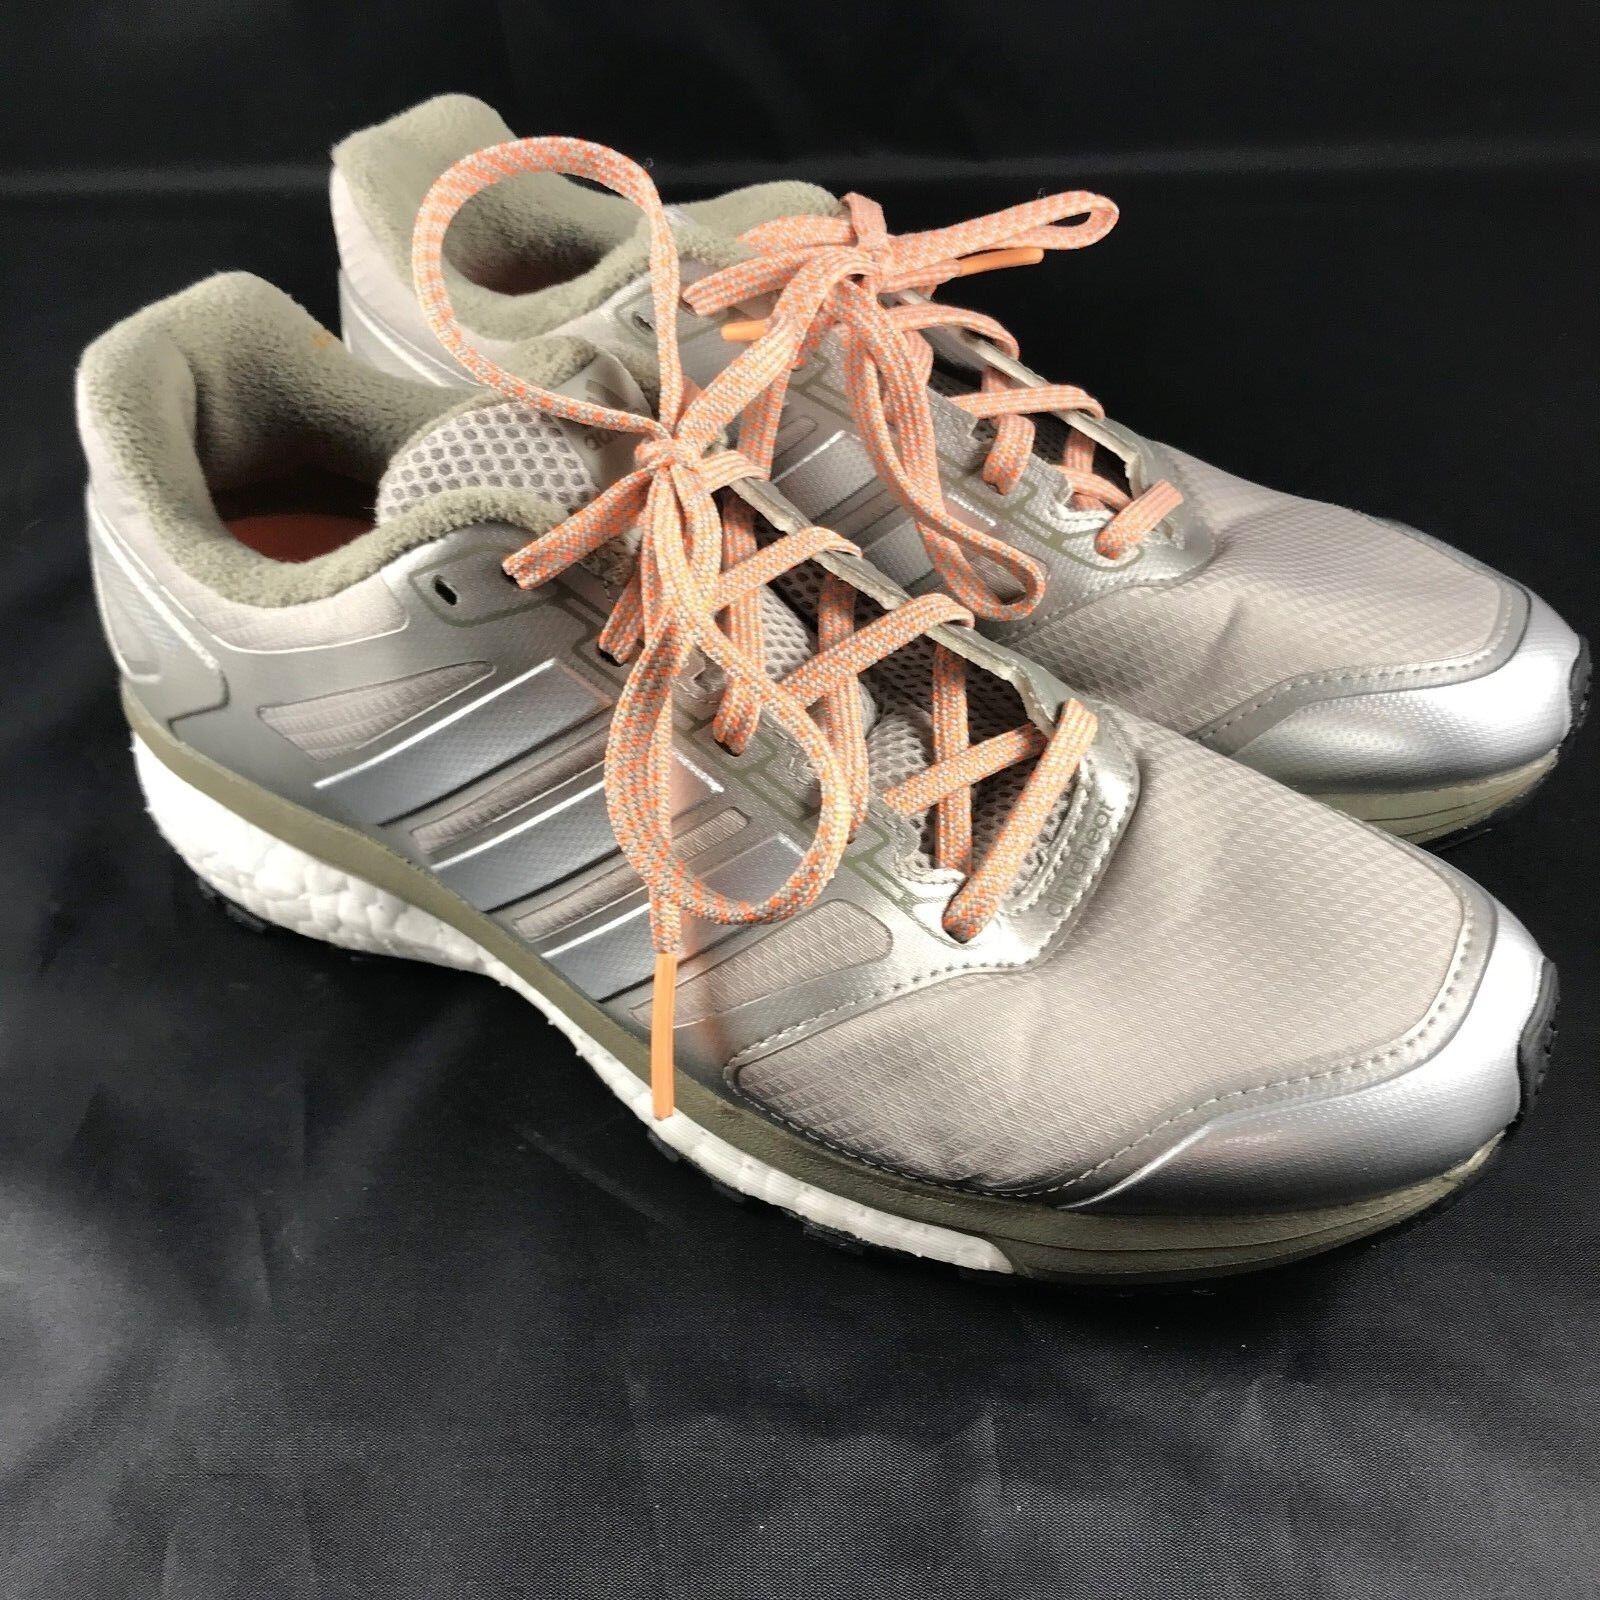 Adidas SUPERNOVA GLIDE BOOST 7 ATR Womens 7.5 39 1//3 Champagne Silver Gold